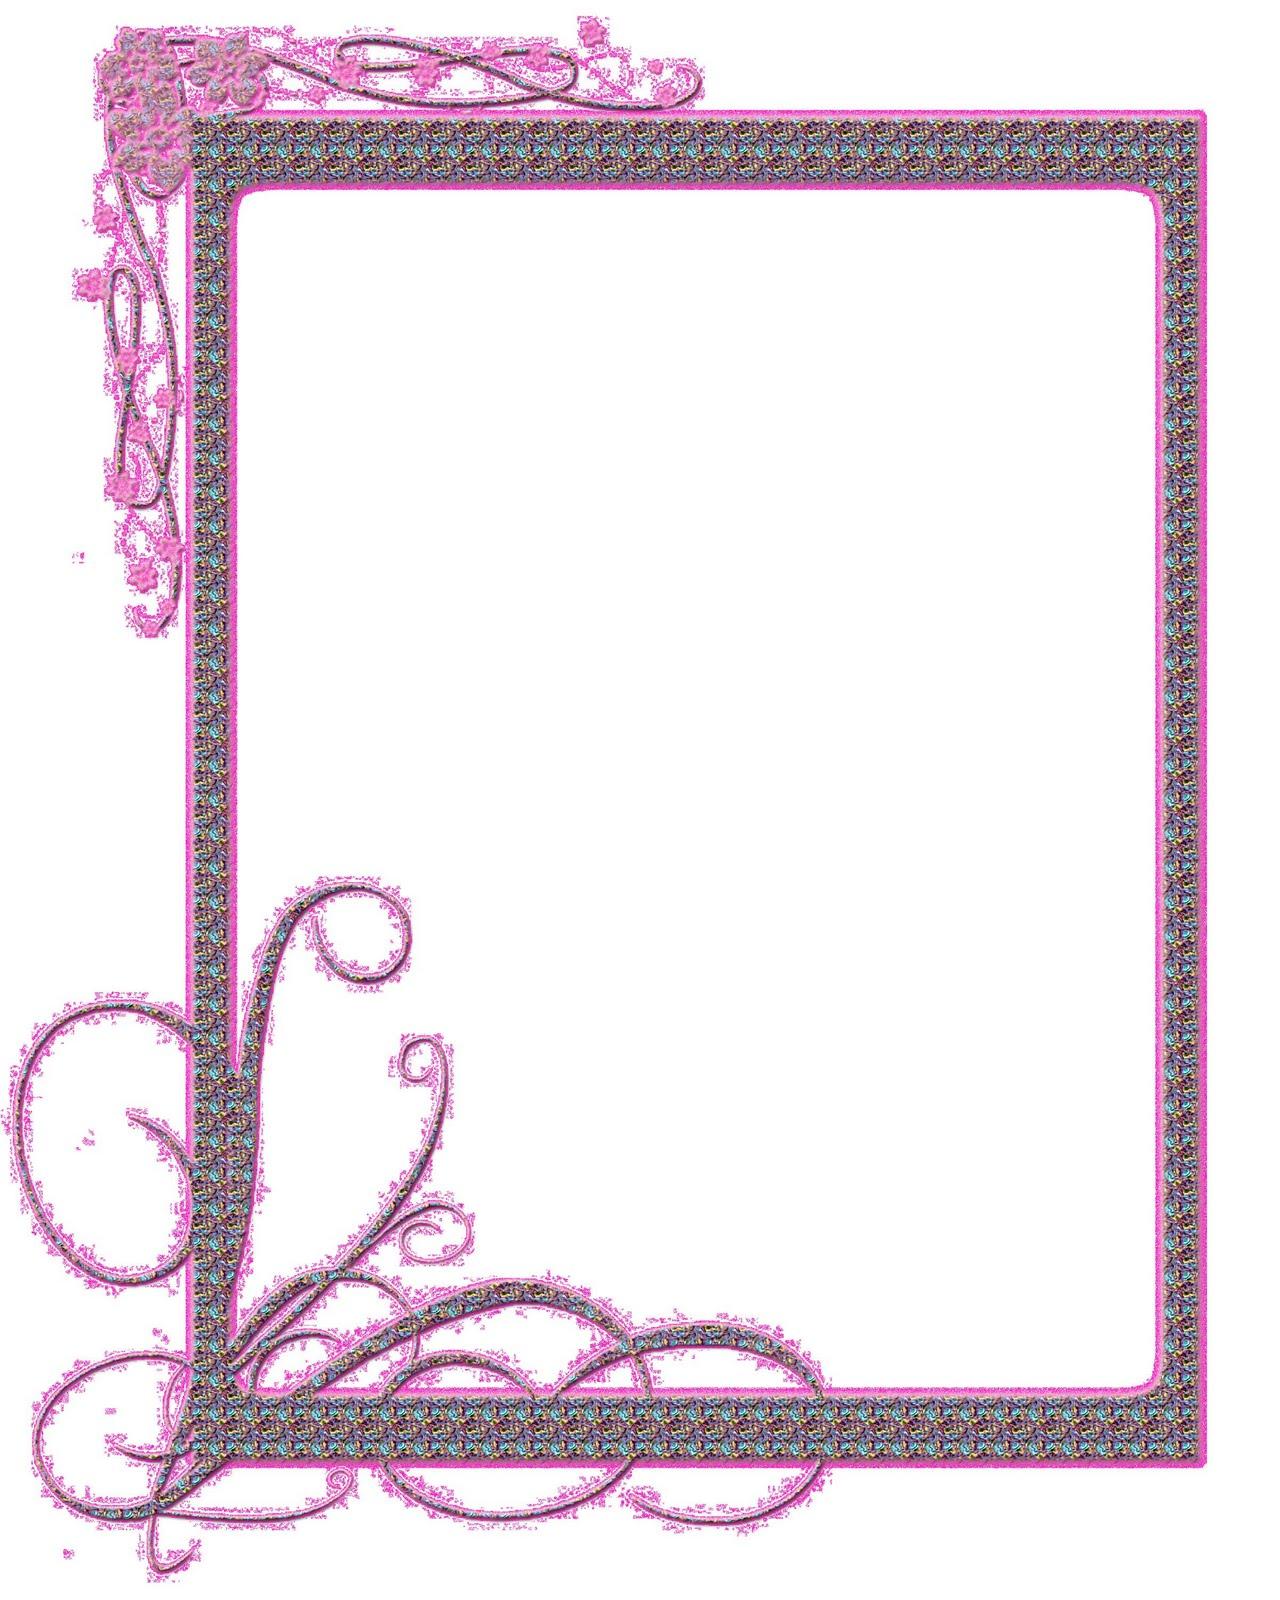 Cool Frame Designs